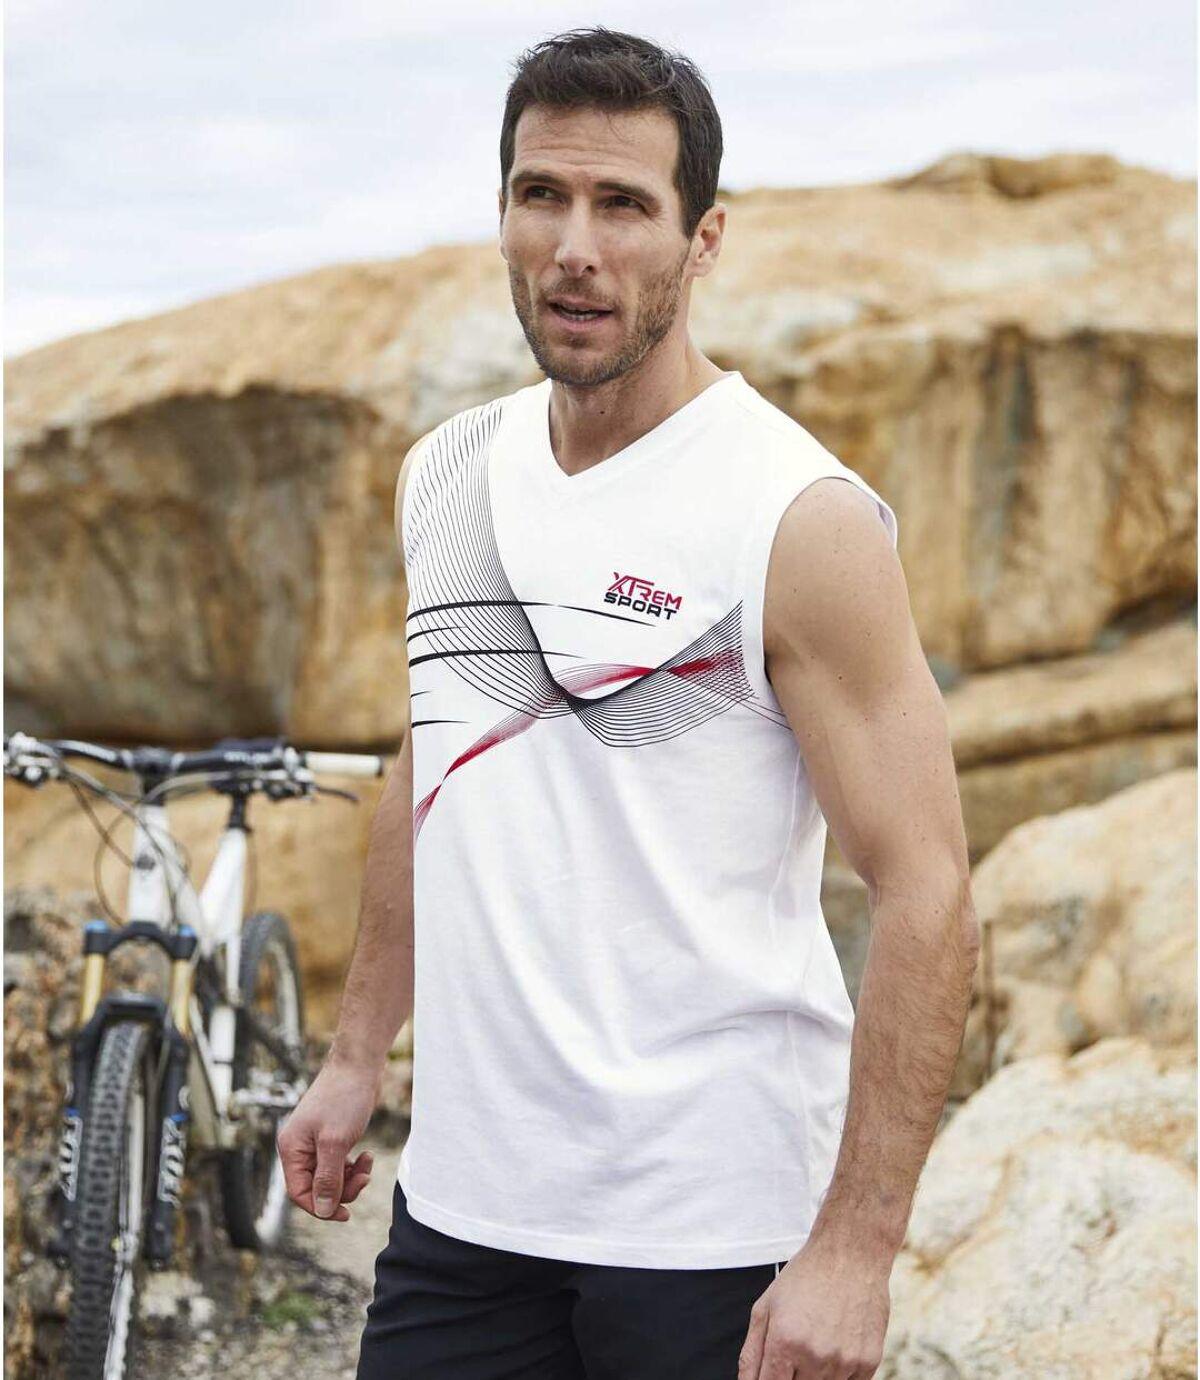 Sada 3 tílek rukávů Sport Line Atlas For Men